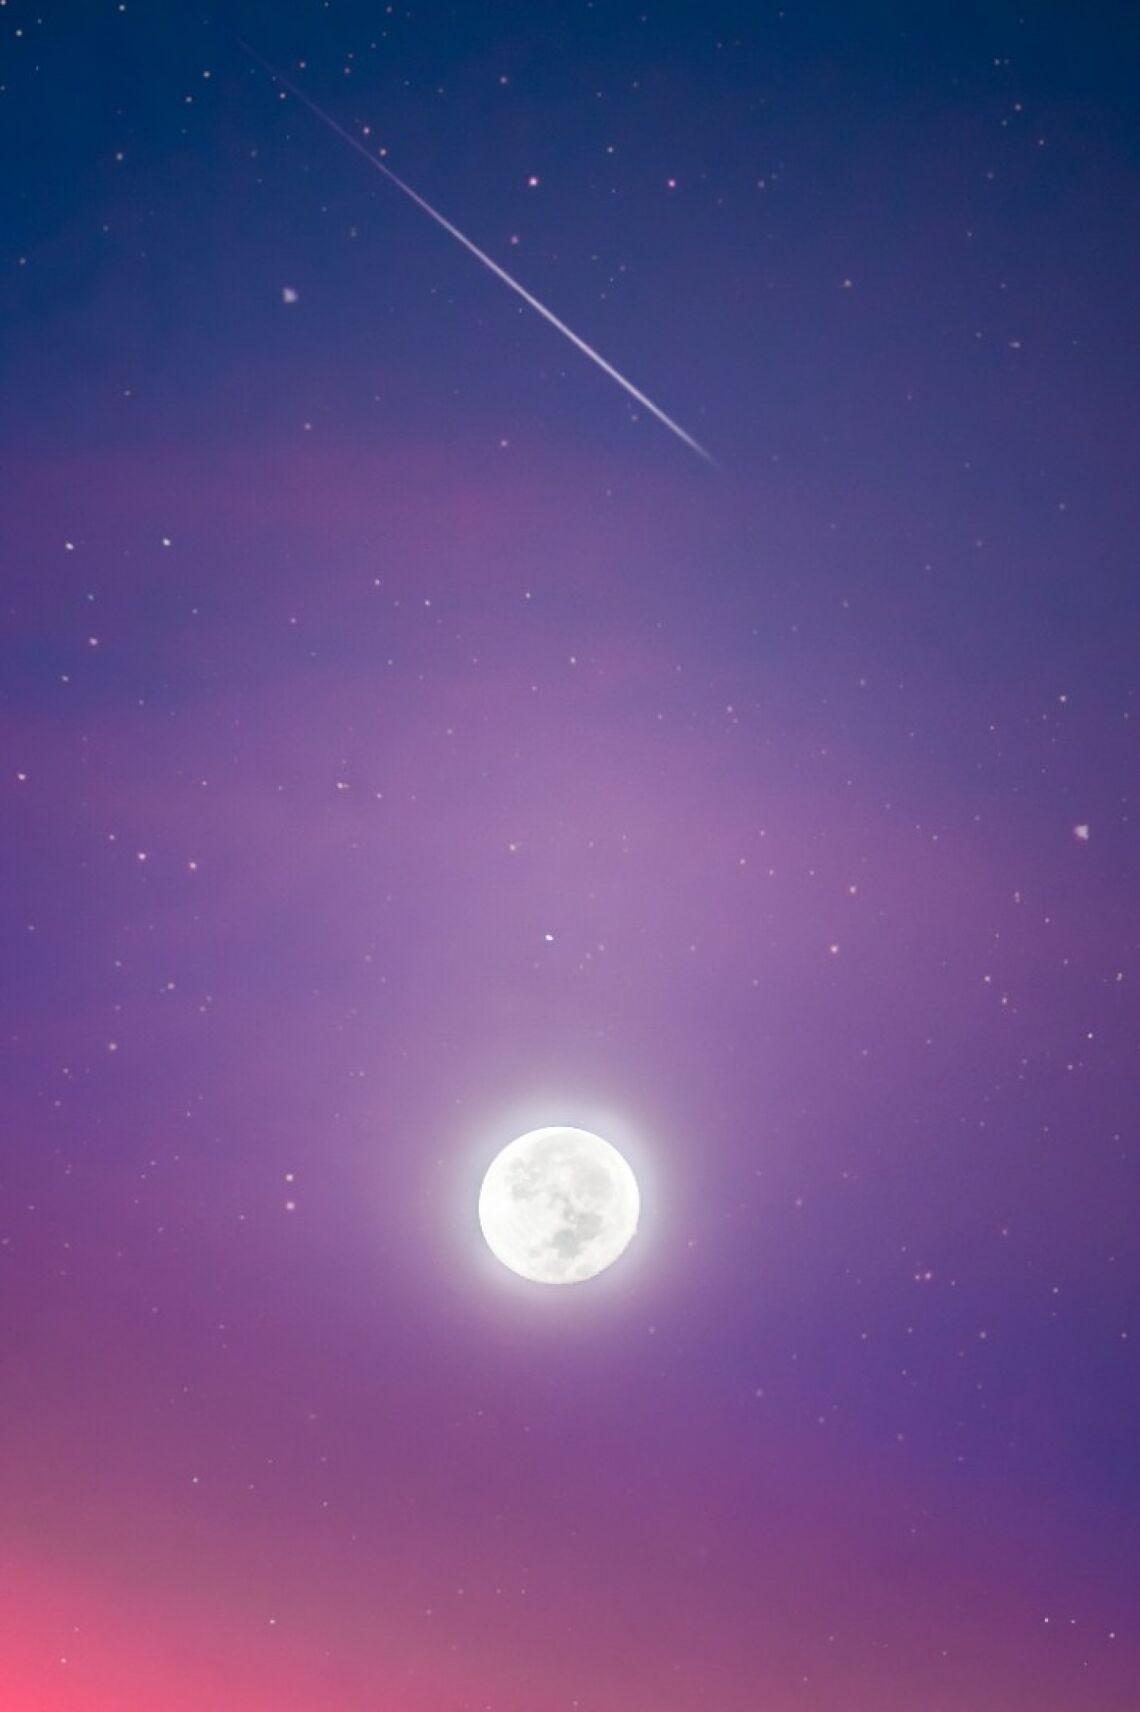 It's the Full Buck Moon! Image